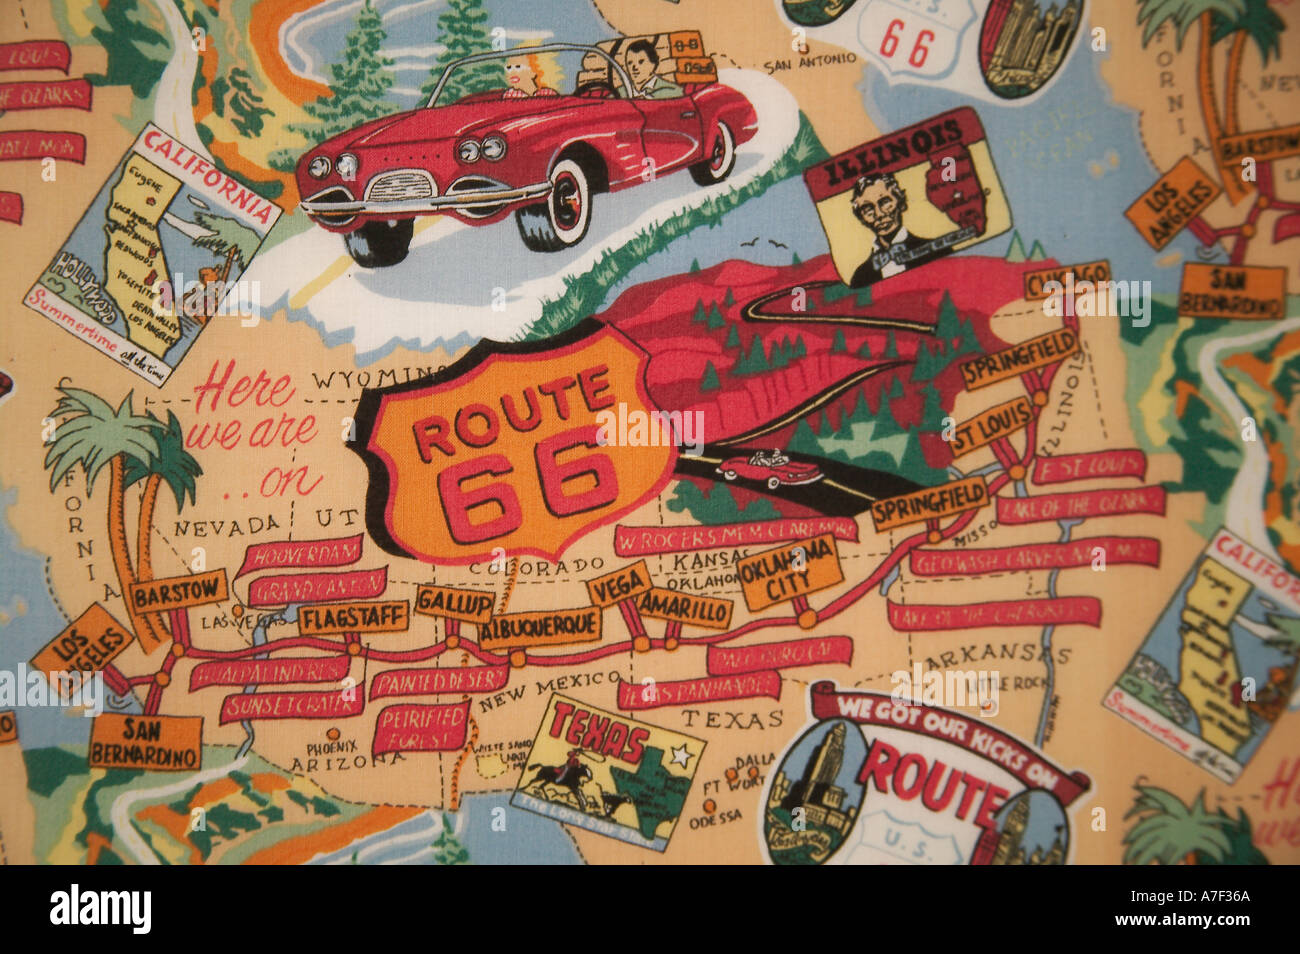 stoff karte von route 66 route 66 museum clinton oklahoma stockfoto bild 521066 alamy. Black Bedroom Furniture Sets. Home Design Ideas